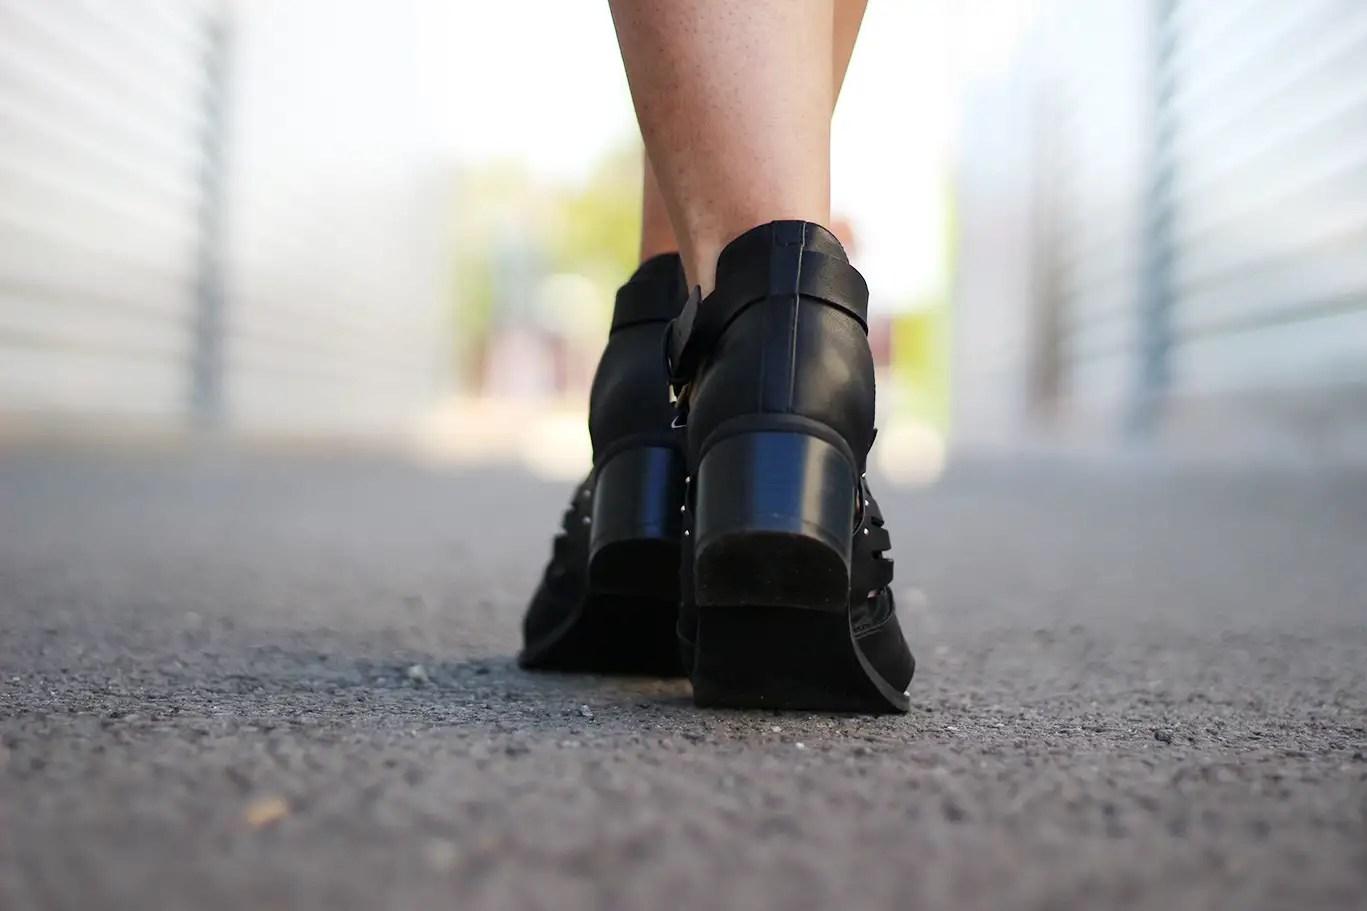 rocknrolla, asos, boohoo, zara, veste metalique zara, sheinside, boots boohoo, boots femme, bottines femme, t-shirt imprimé, blog mode, shein, pull and bear, sac franges, bomber zara, des habits malaia